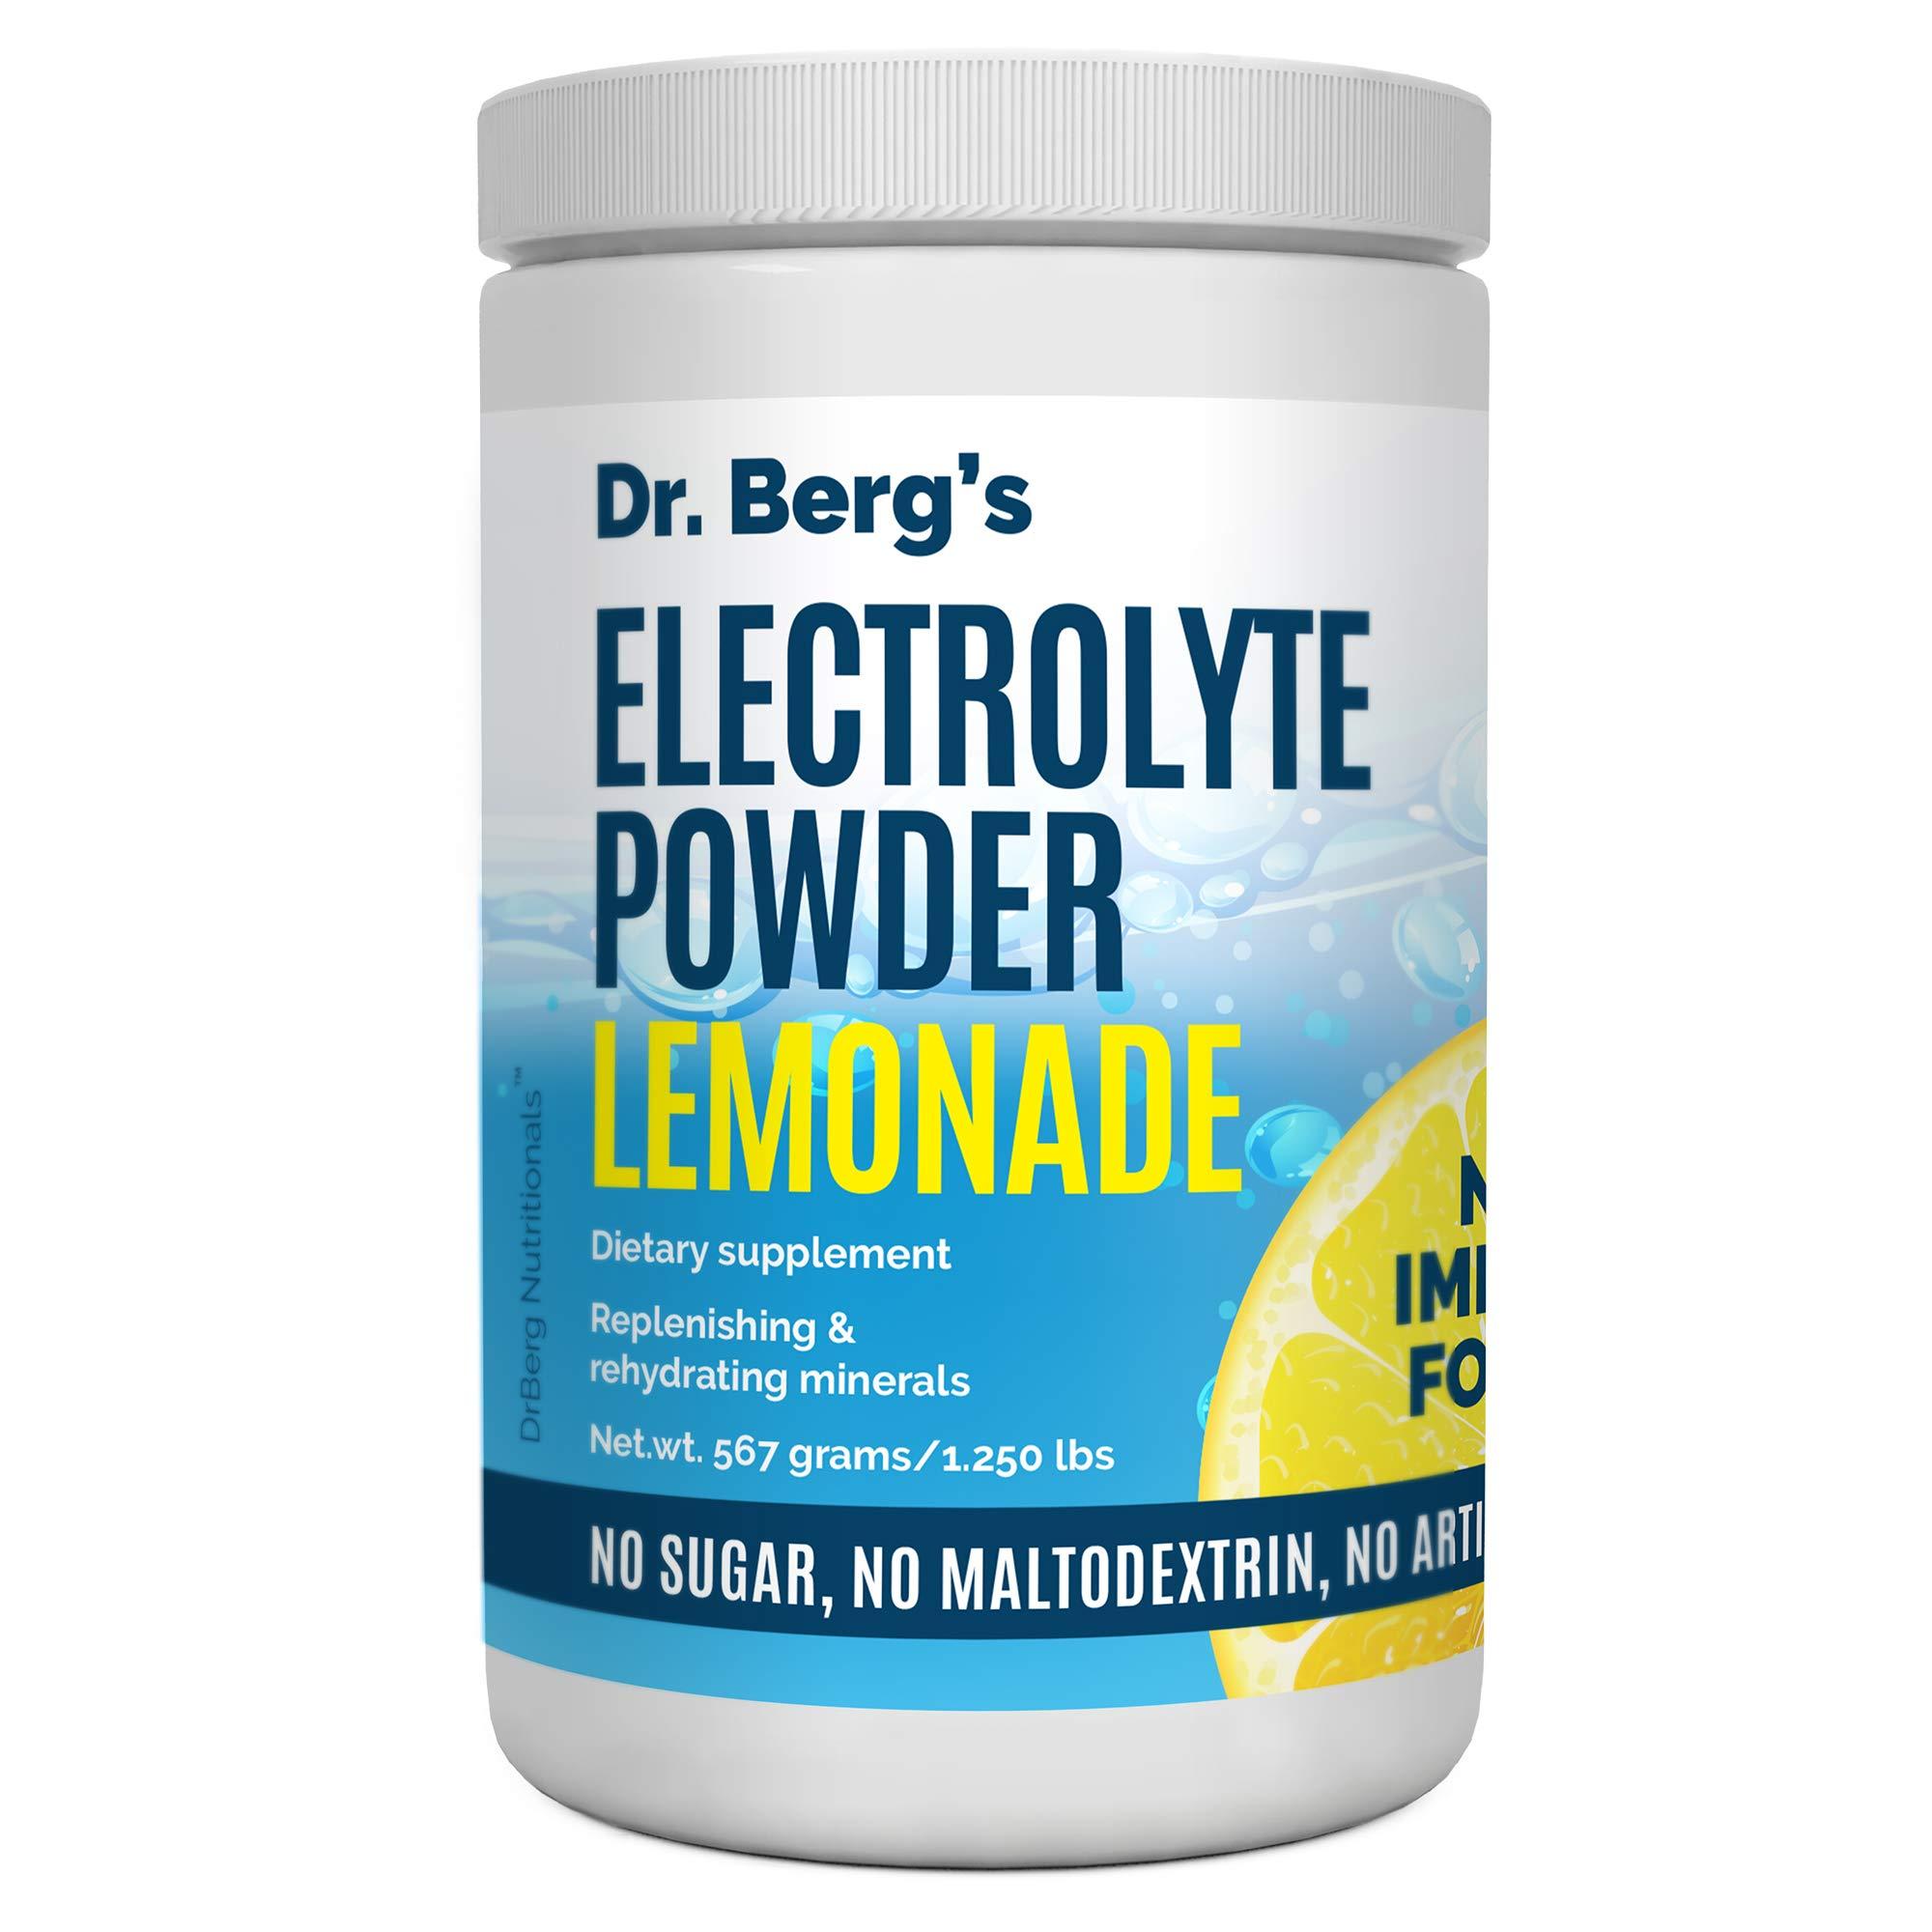 Dr. Berg's Original Electrolyte Powder Lemonade Extra - 90 Servings, High Energy, Replenish & Rejuvenate Your Cells, NO Maltodextrin or Sugar, No Ingredients from China, Amazing Lemon Flavor